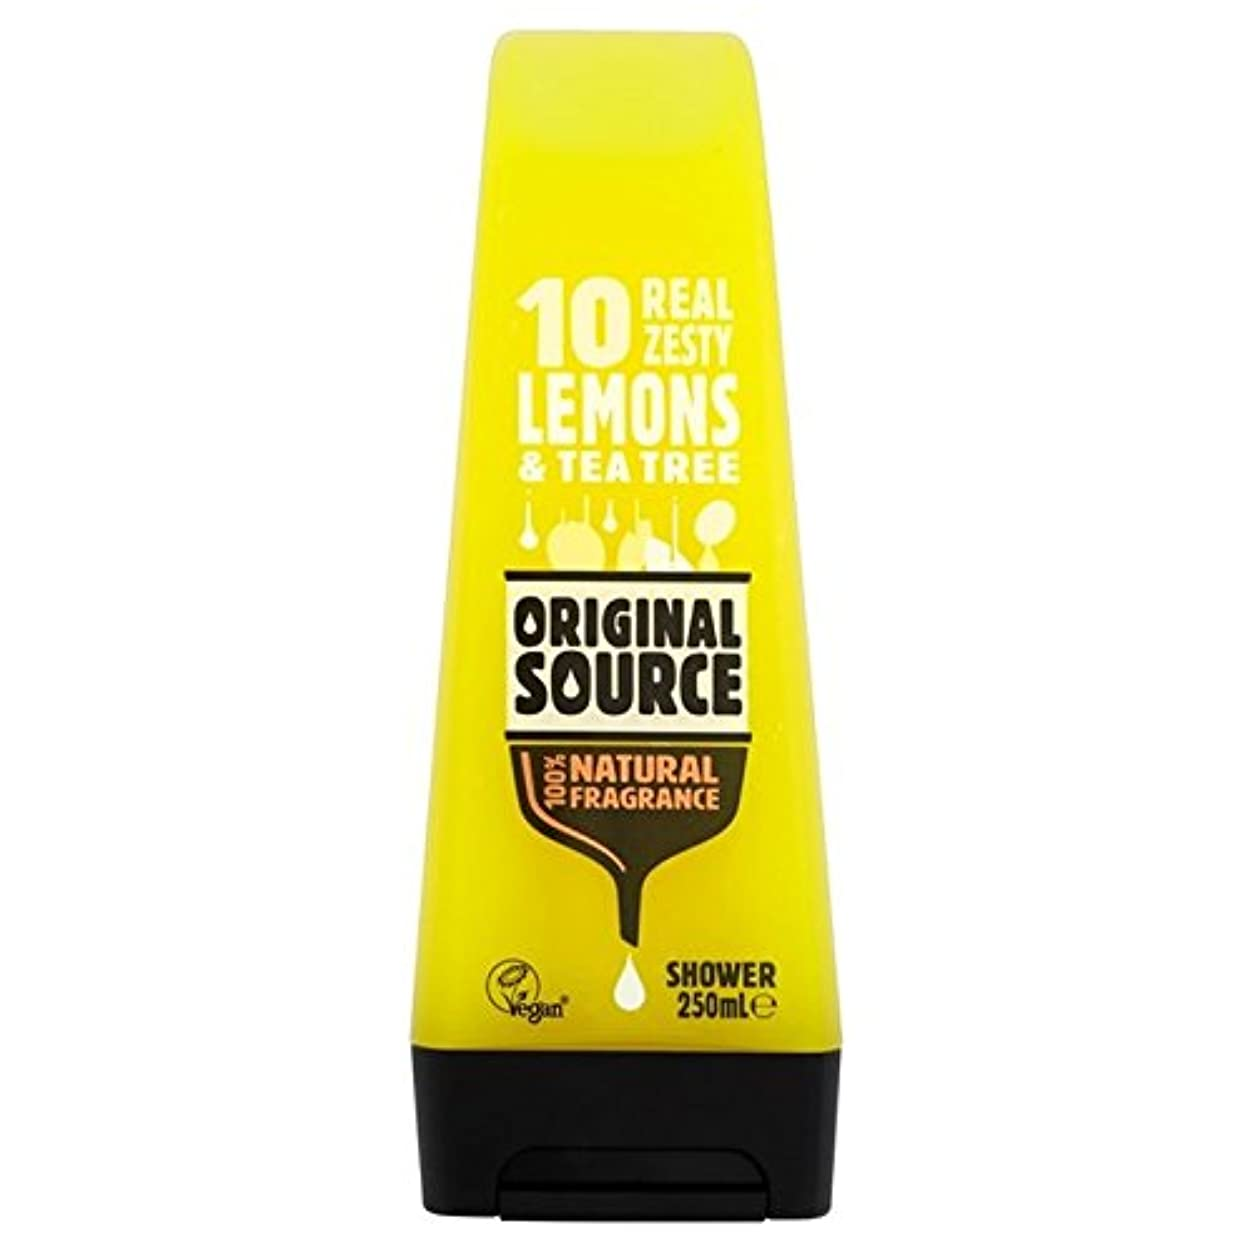 Original Source Lemon Shower Gel 250ml (Pack of 6) - 元のソースのレモンシャワージェル250ミリリットル x6 [並行輸入品]